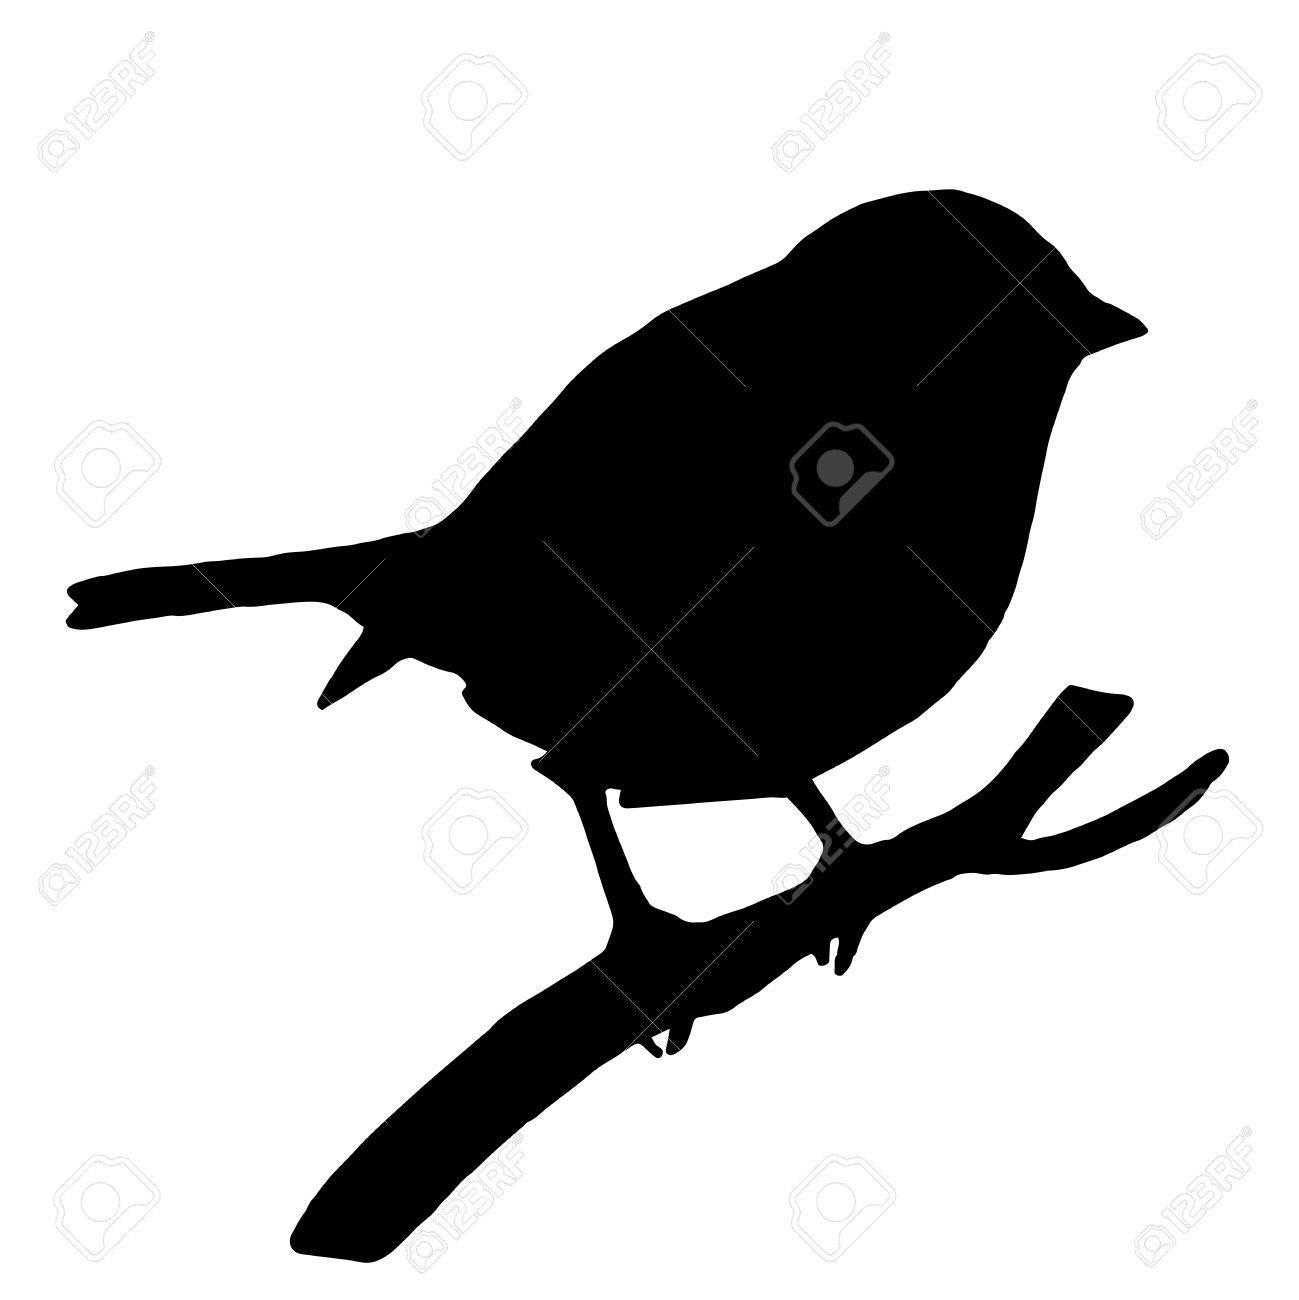 High quality original Silhouette bird on ash branch - 63249101